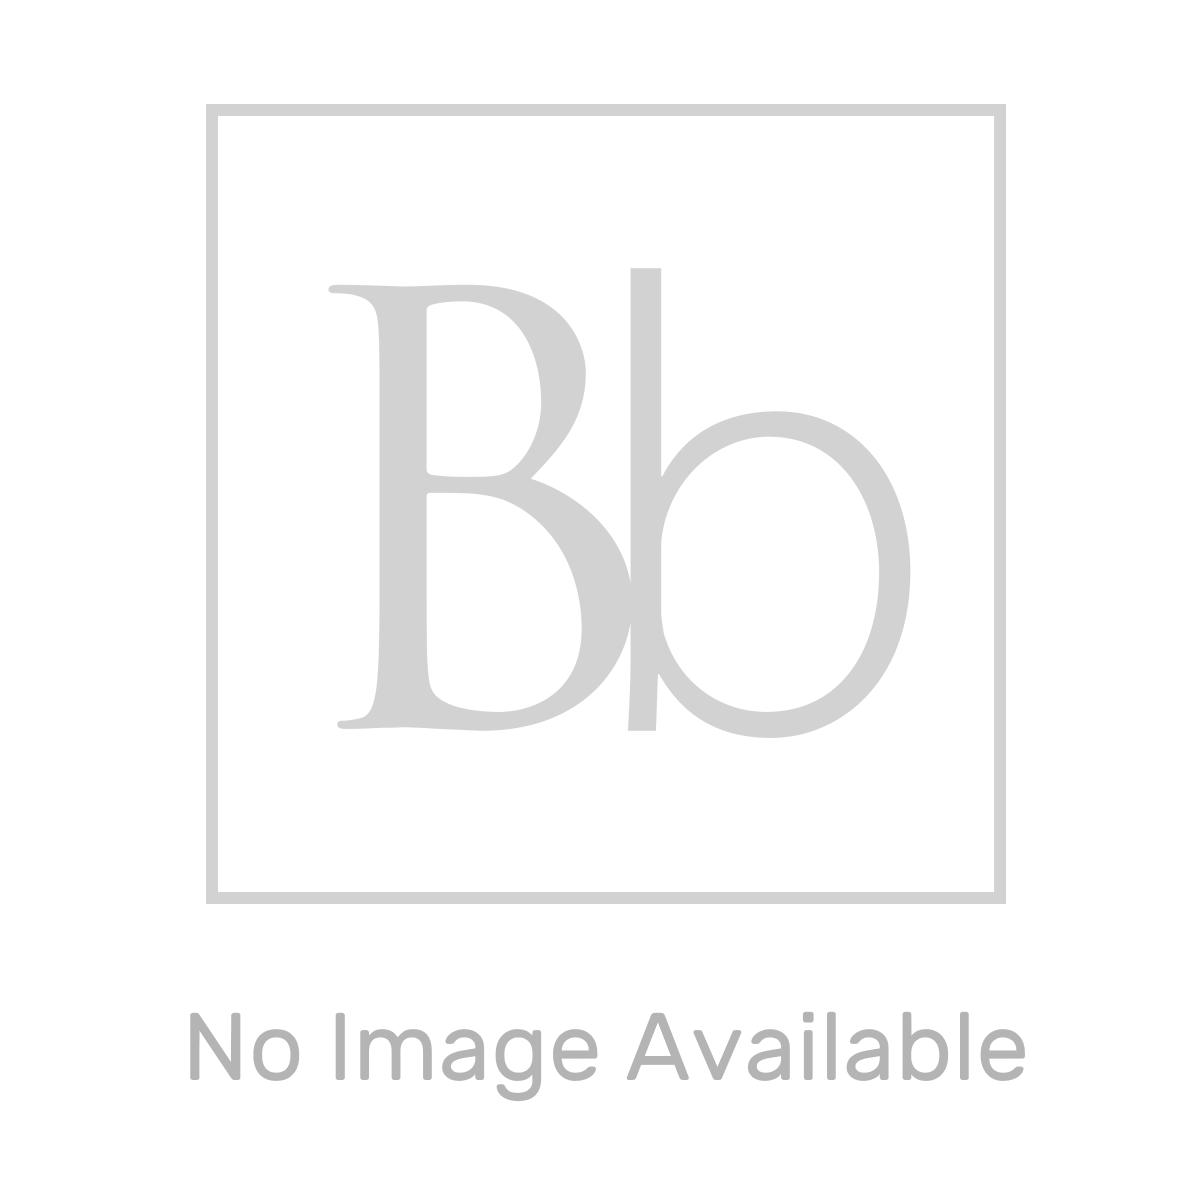 HiB Celeste LED Bathroom Mirror with Shelf